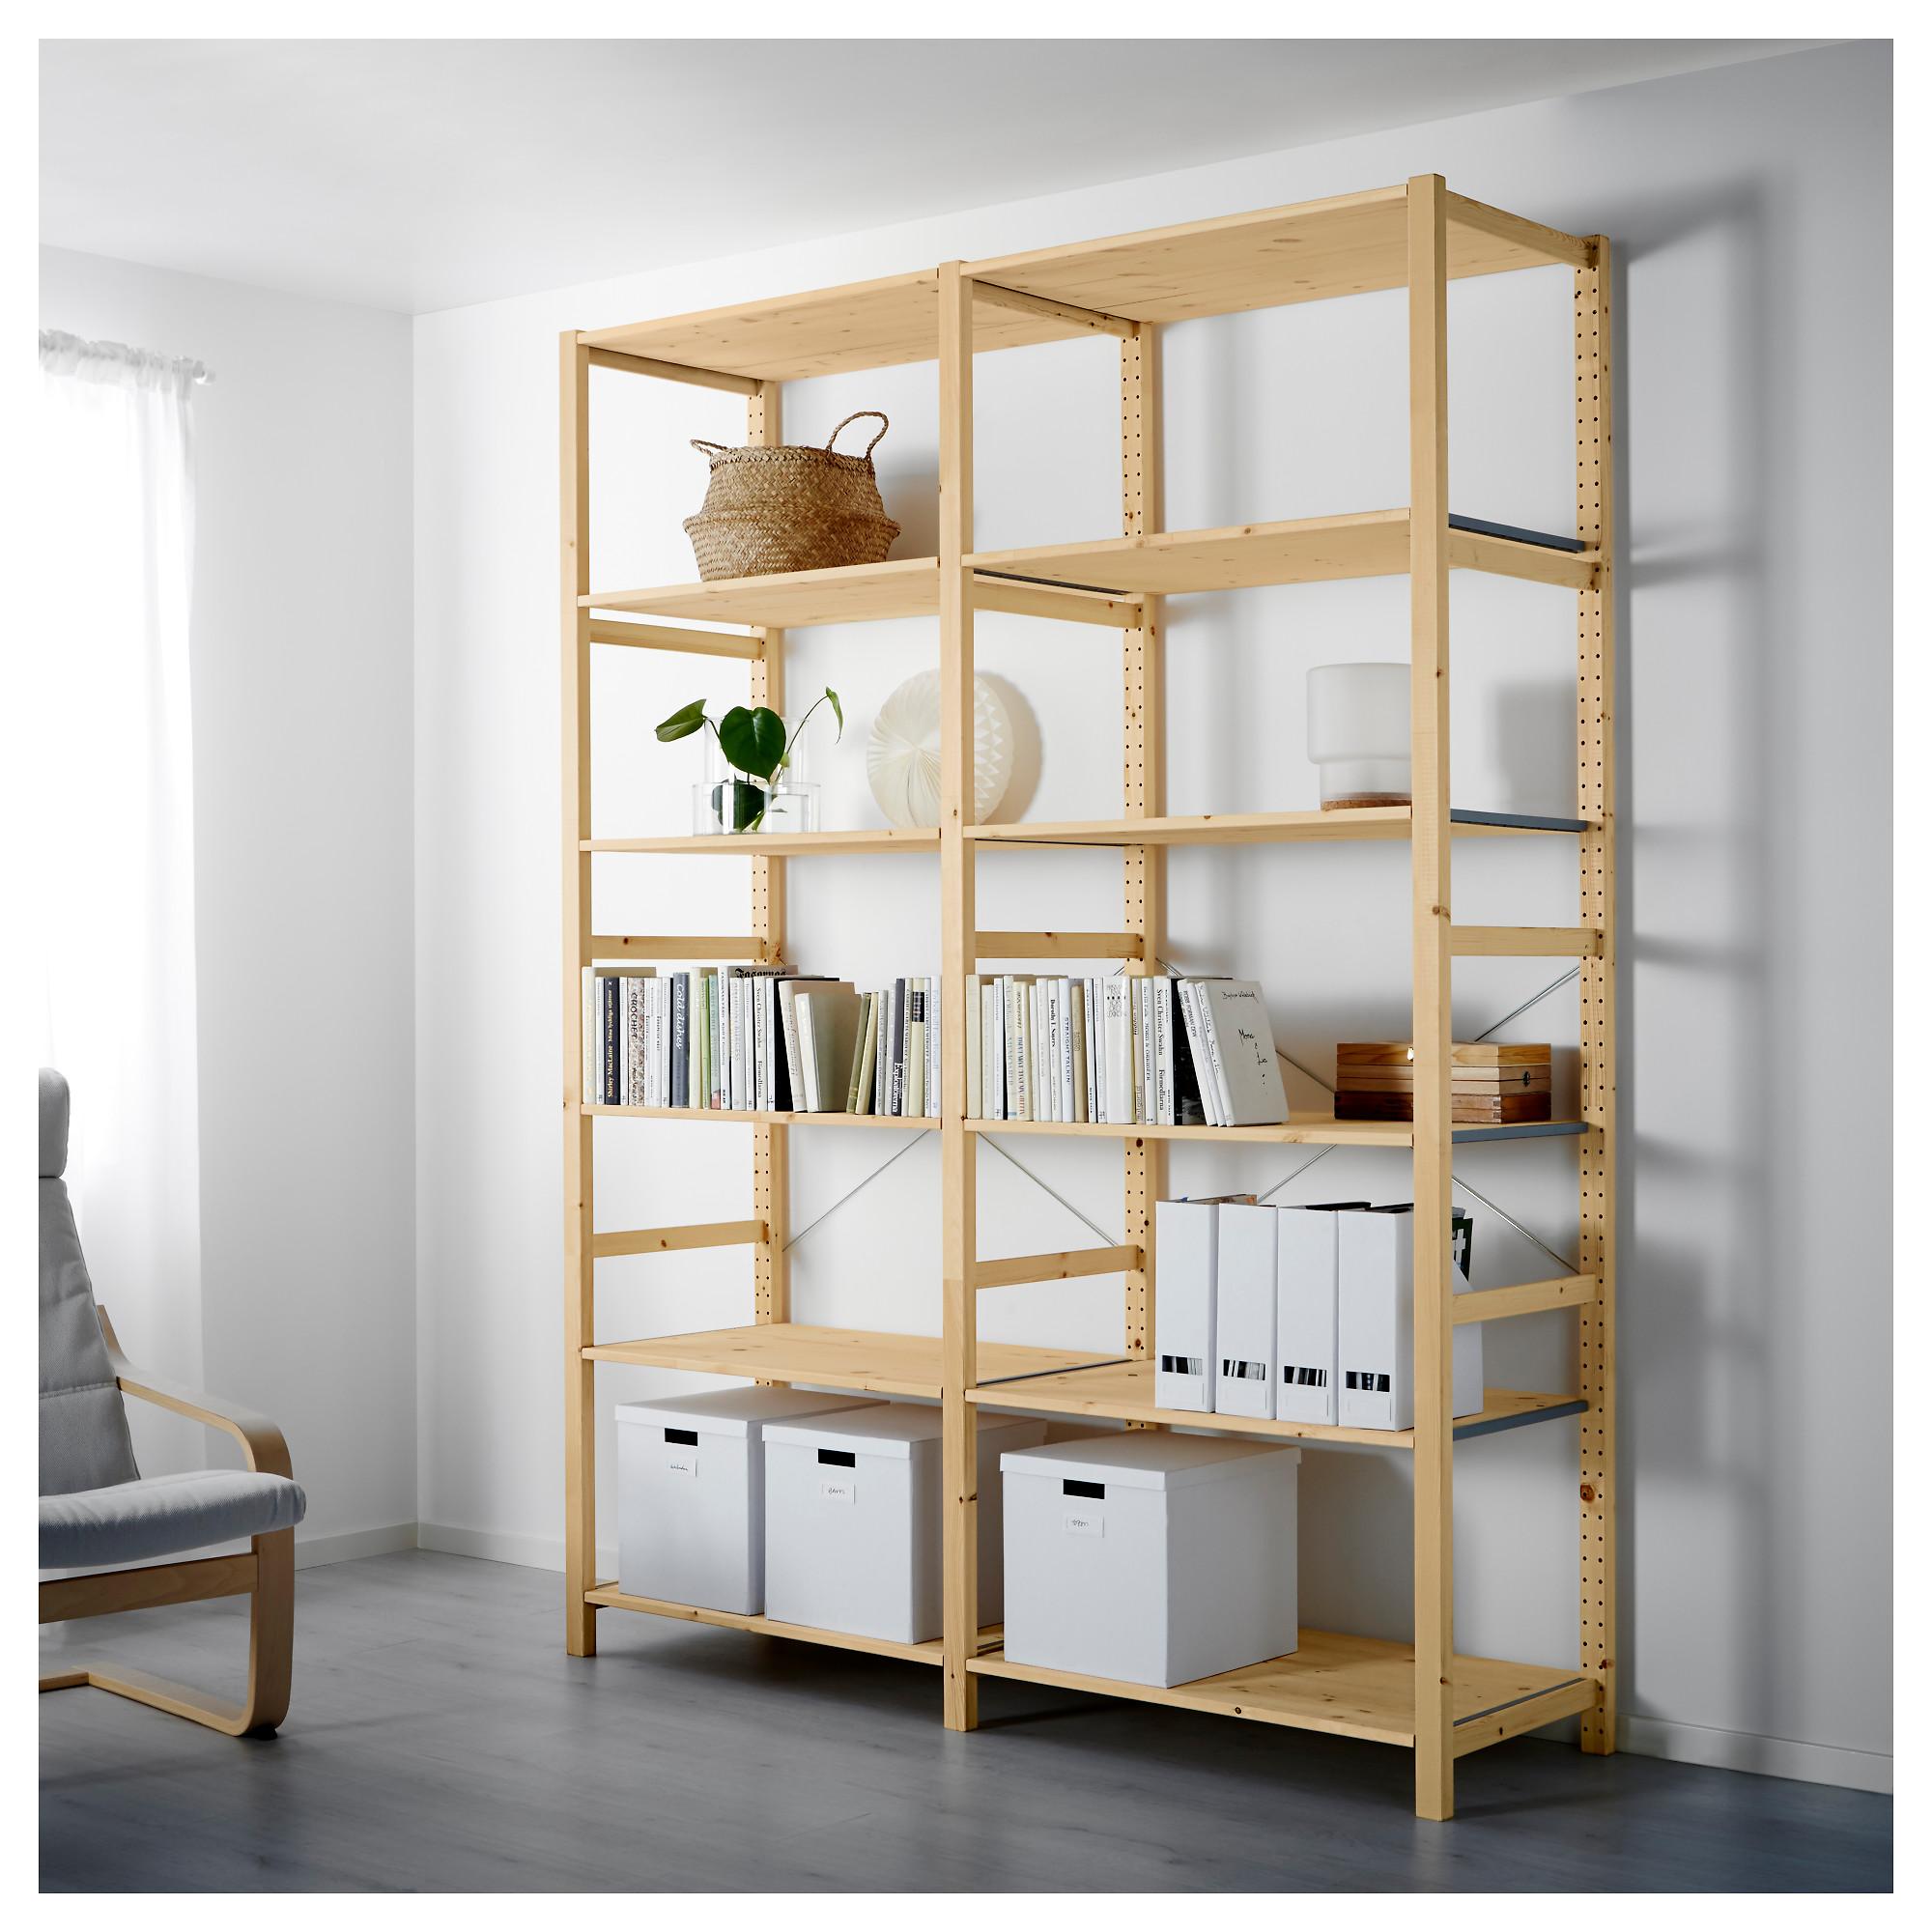 Us Furniture And Home Furnishings Shelves Ikea Home Furnishings